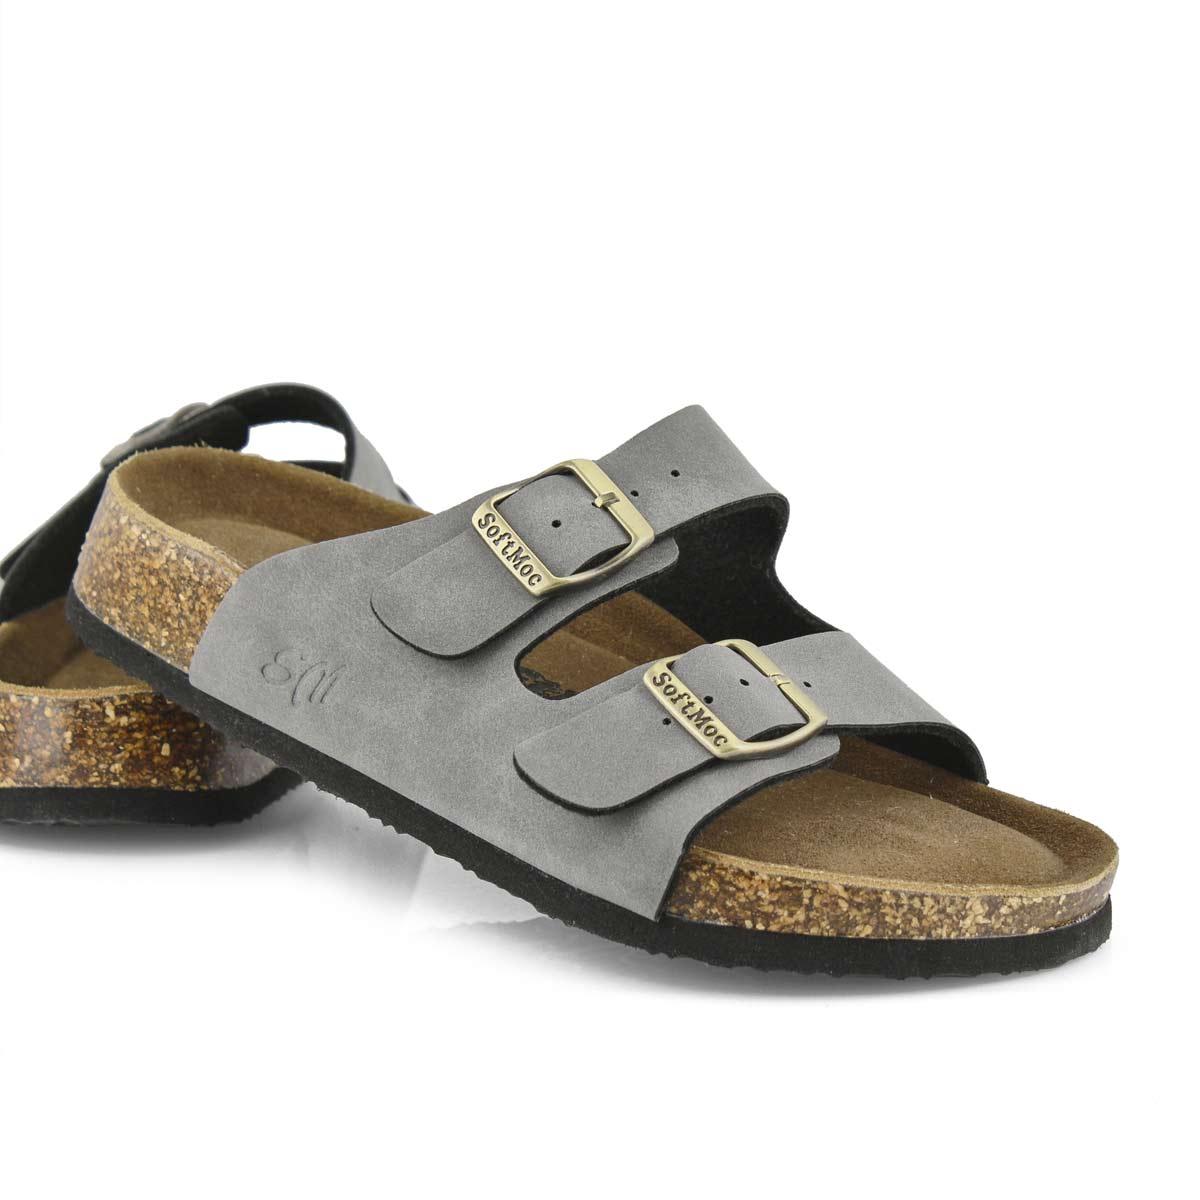 Lds Anna 5 PU gry memory foam sld sandal